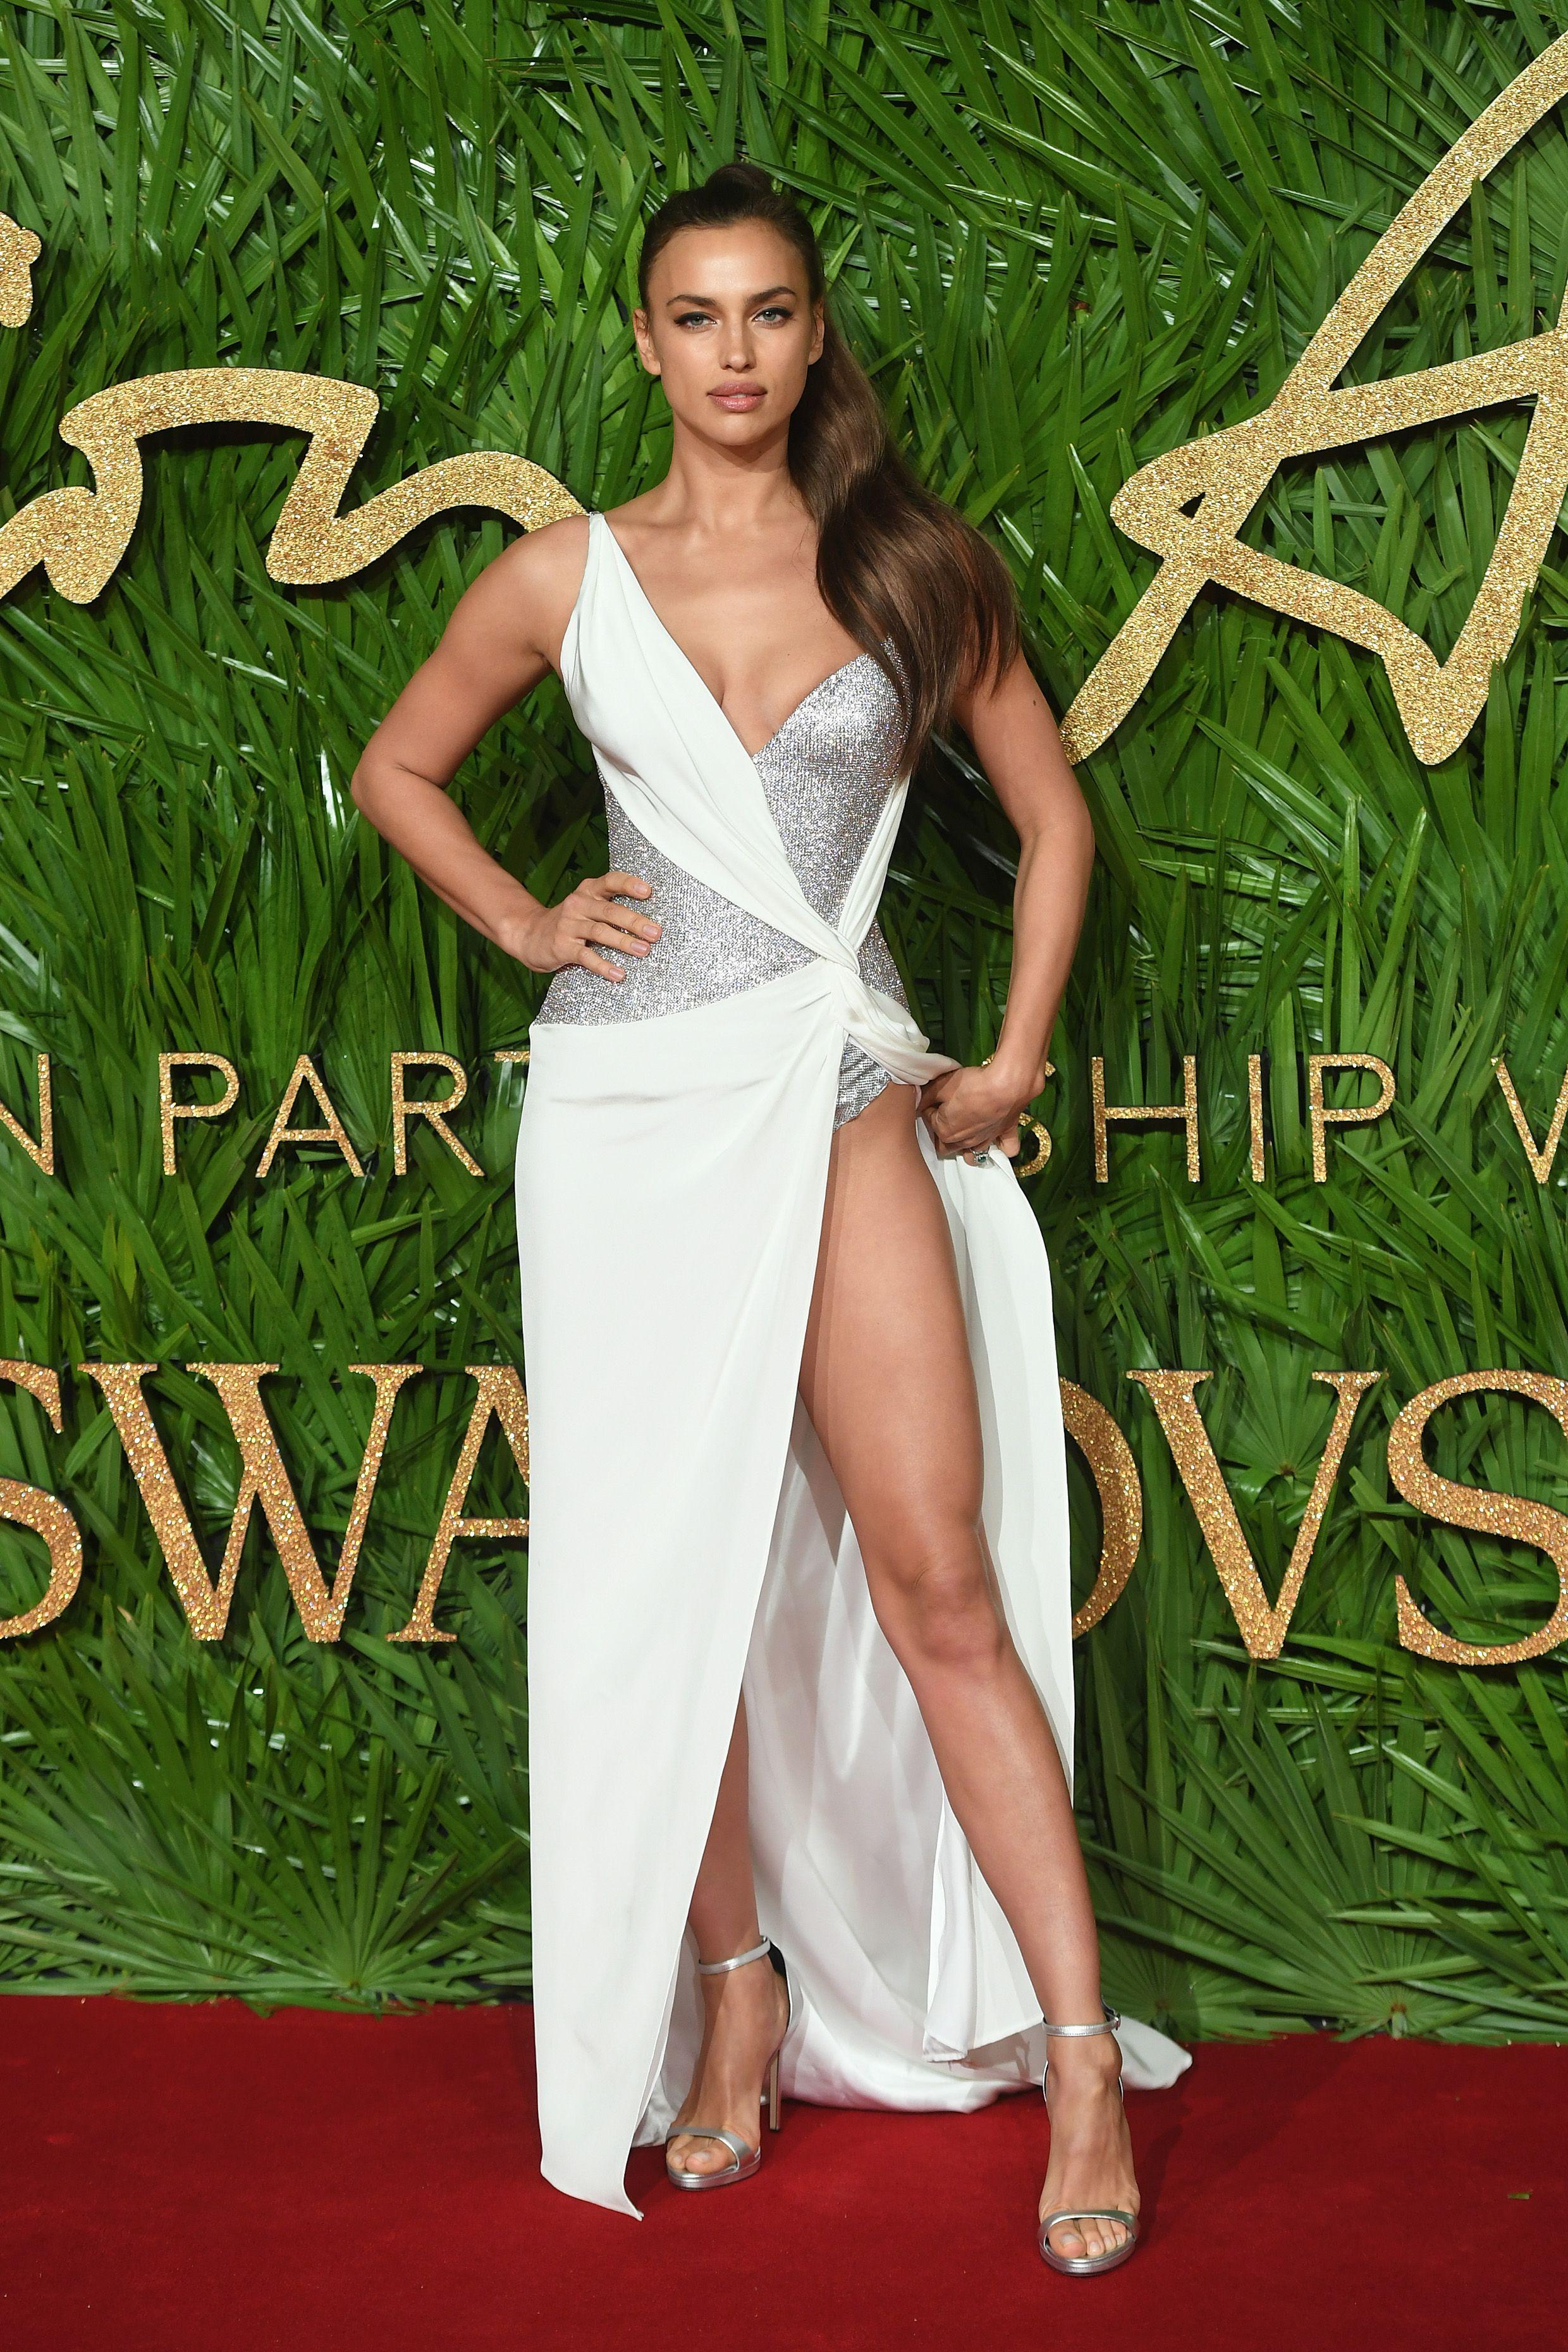 ae12fb5f1a1 The 33 Best Irina Shayk Outfits Through the Years